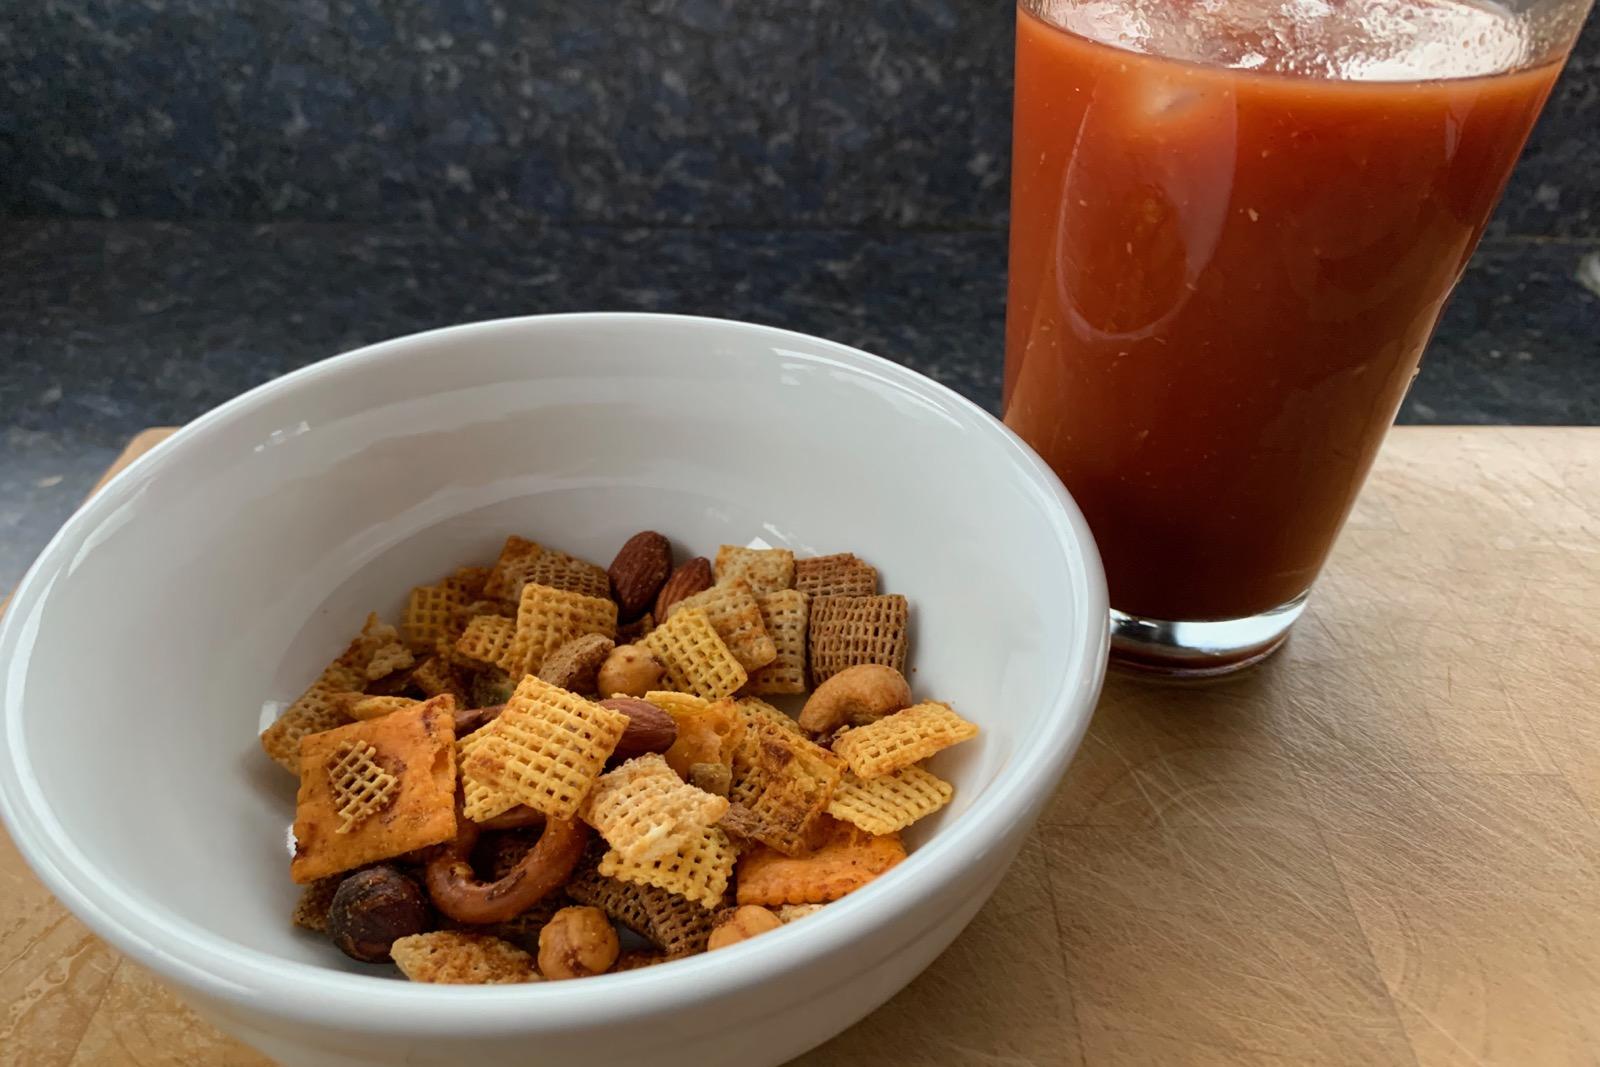 http://blog.rickk.com/food/2020/02/09/ate.2020.02.09.s1.jpg